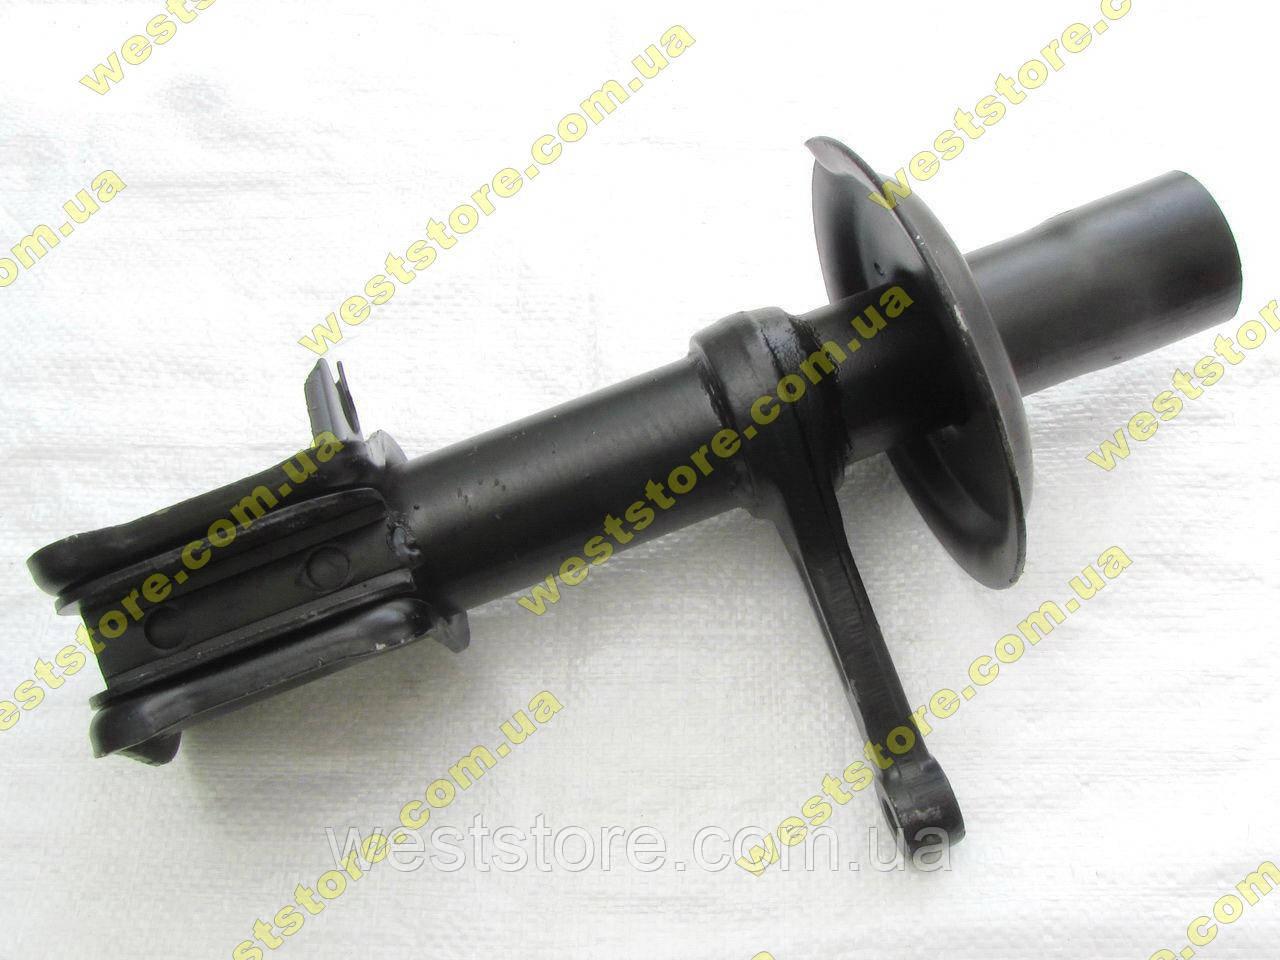 Корпус переднего амортизатора Ваз 2108 2109 21099  2113, 2114, 2115  левый СААЗ скопин